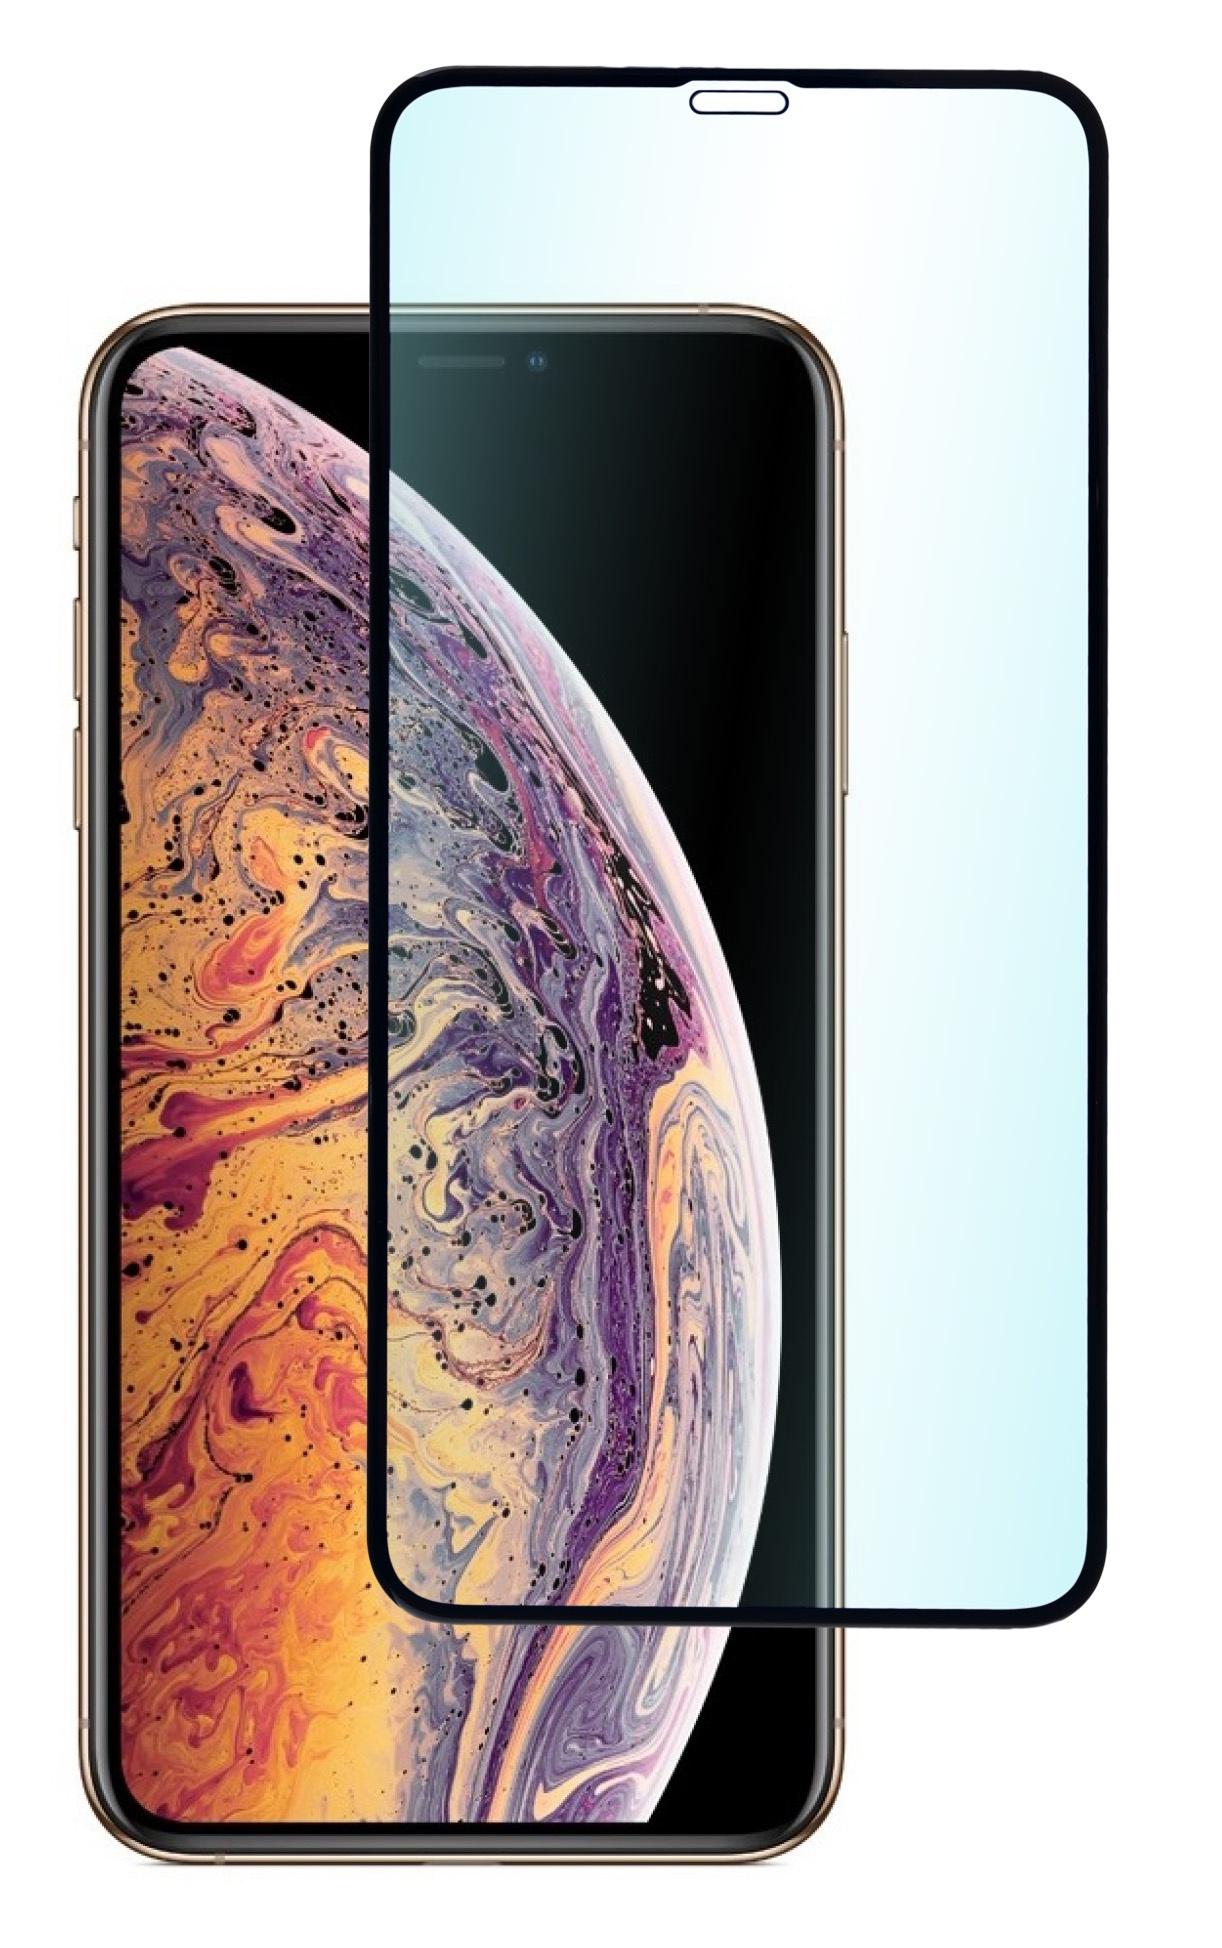 Защитное стекло skinBOX 3D full glue, 4630042522640, черный perfeo защитное стекло apple iphone xs max черный 2 5d full screen gorilla pf a4469